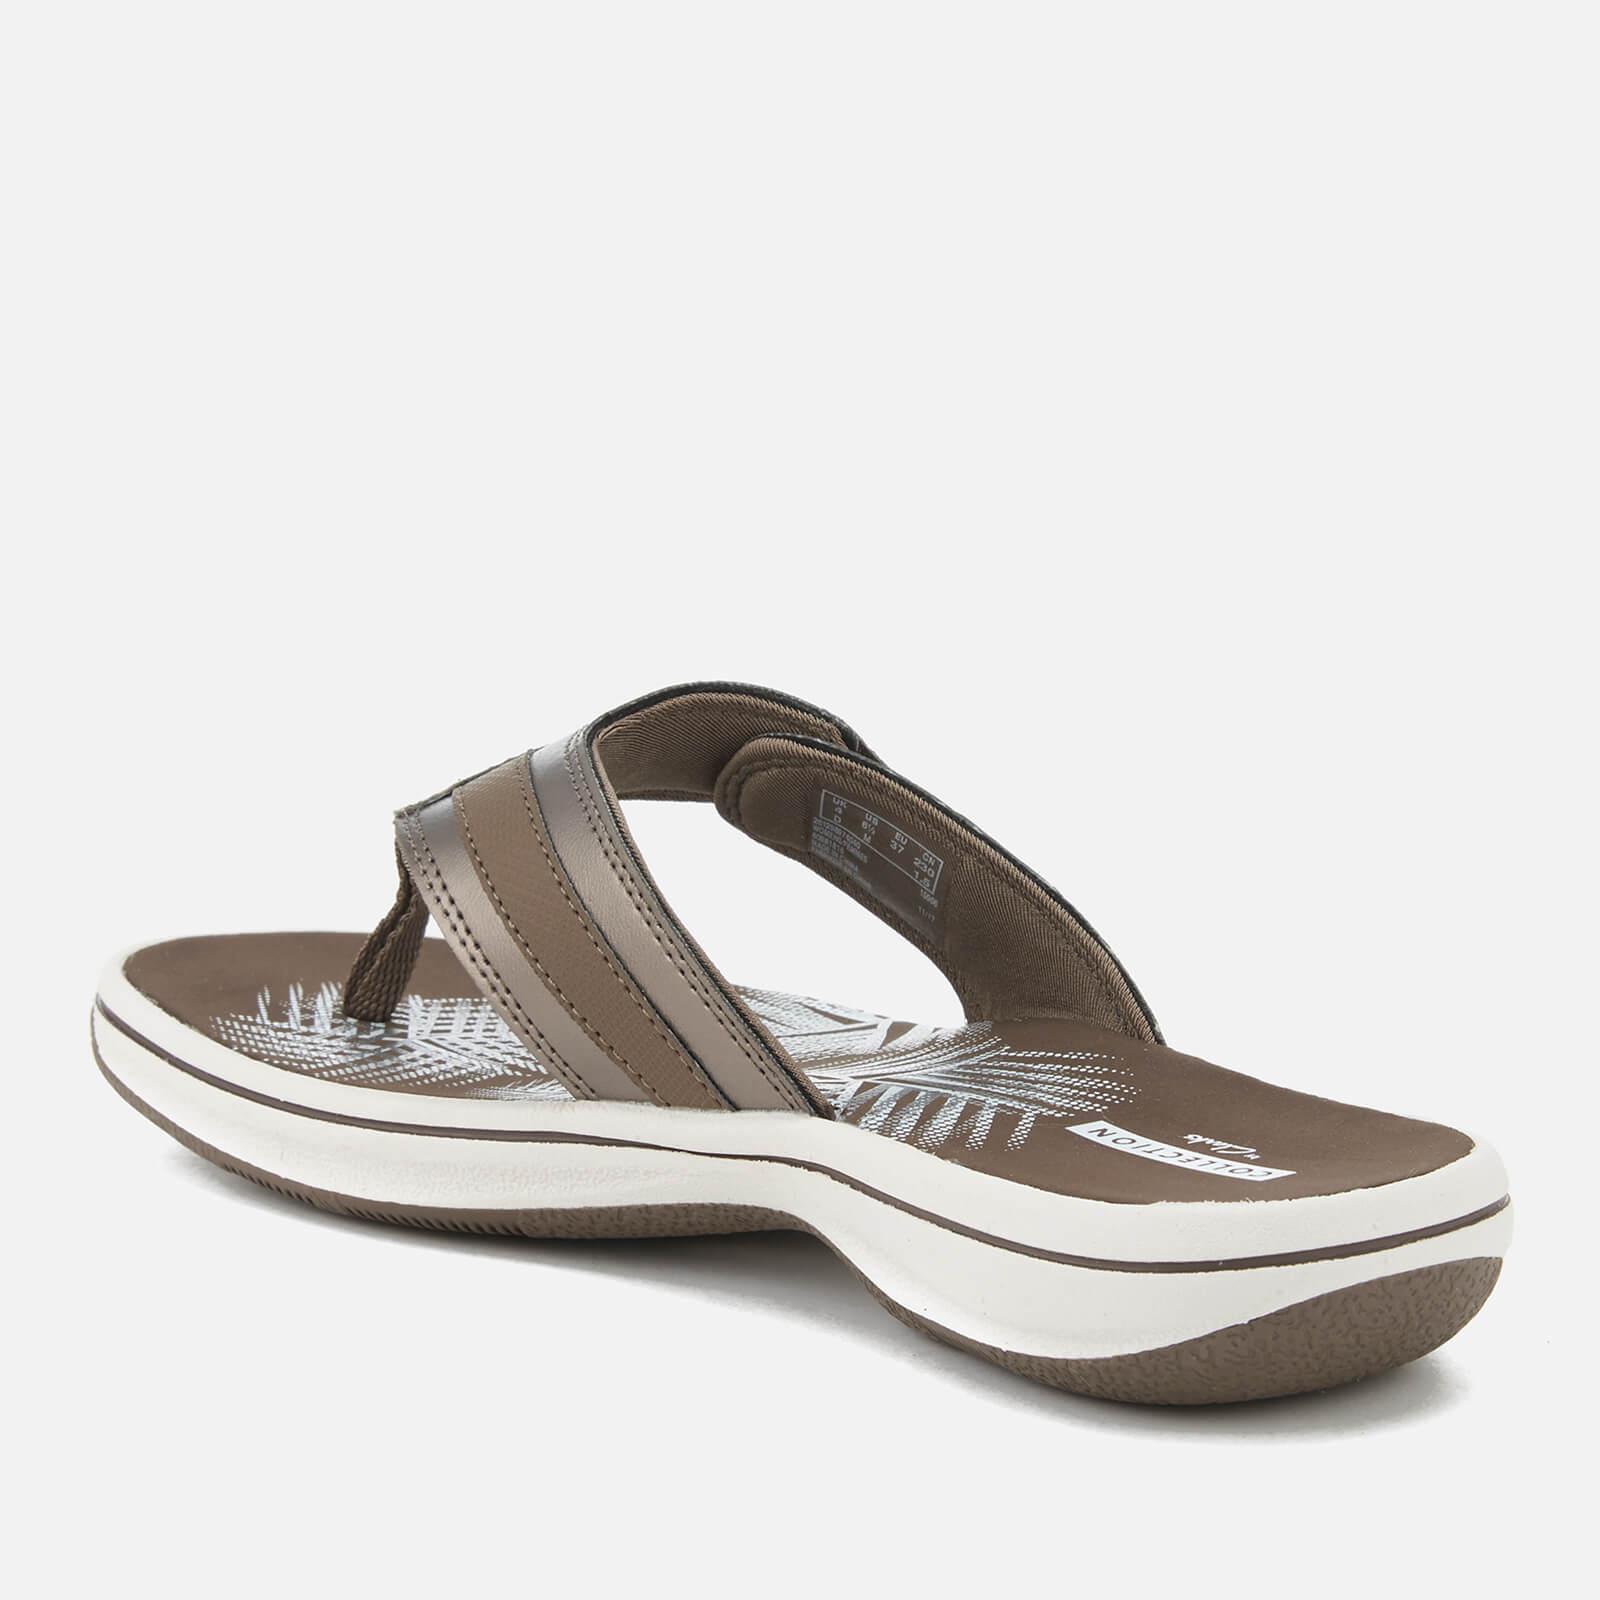 c7d0610179c2 Lyst - Clarks Brinkley Sea Toe Post Sandals in Gray